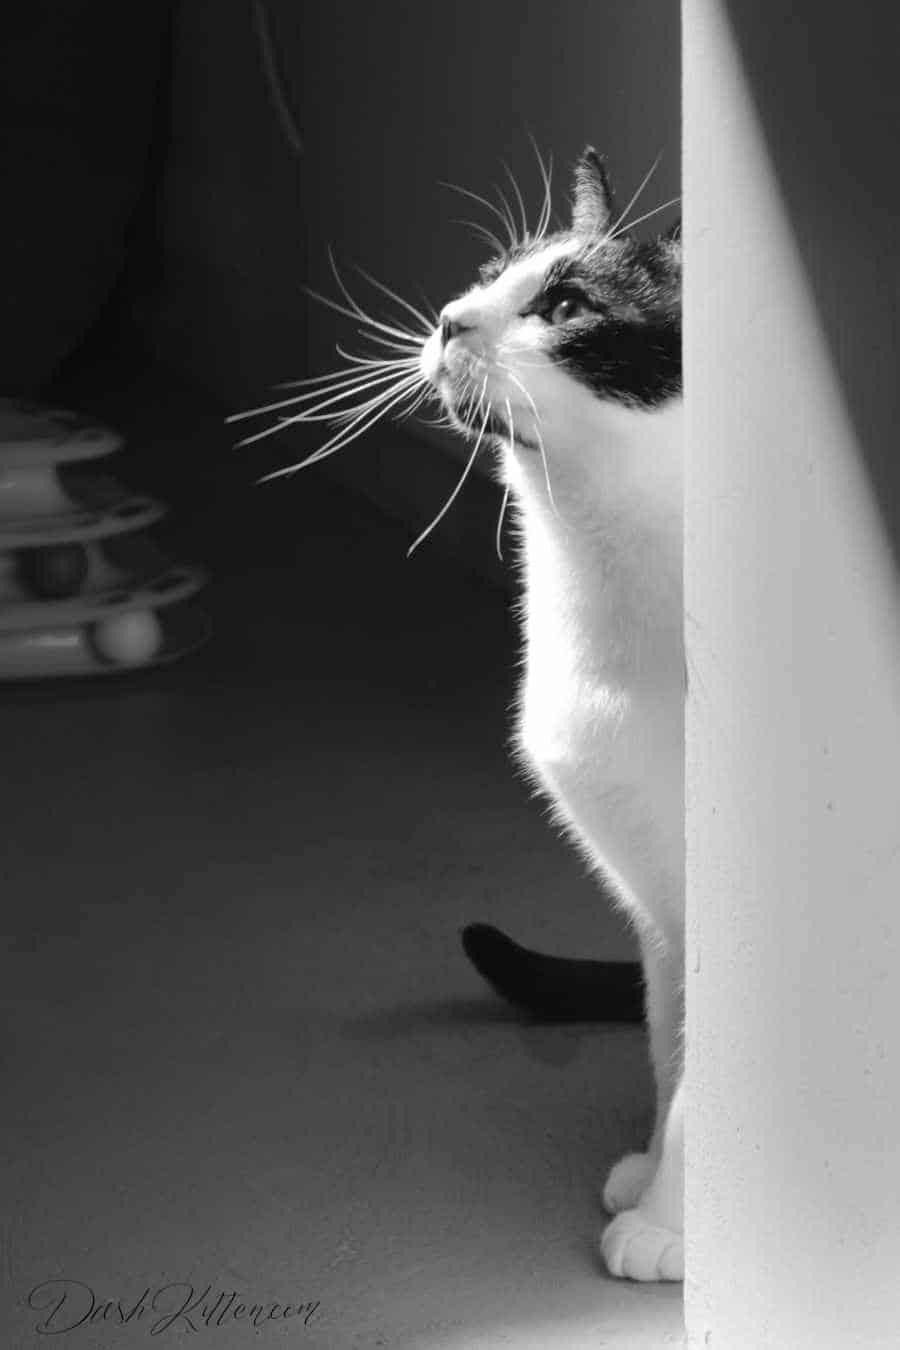 A Black and White Photographic Portrait 'Chenzou Surveys the Cat Cafe'